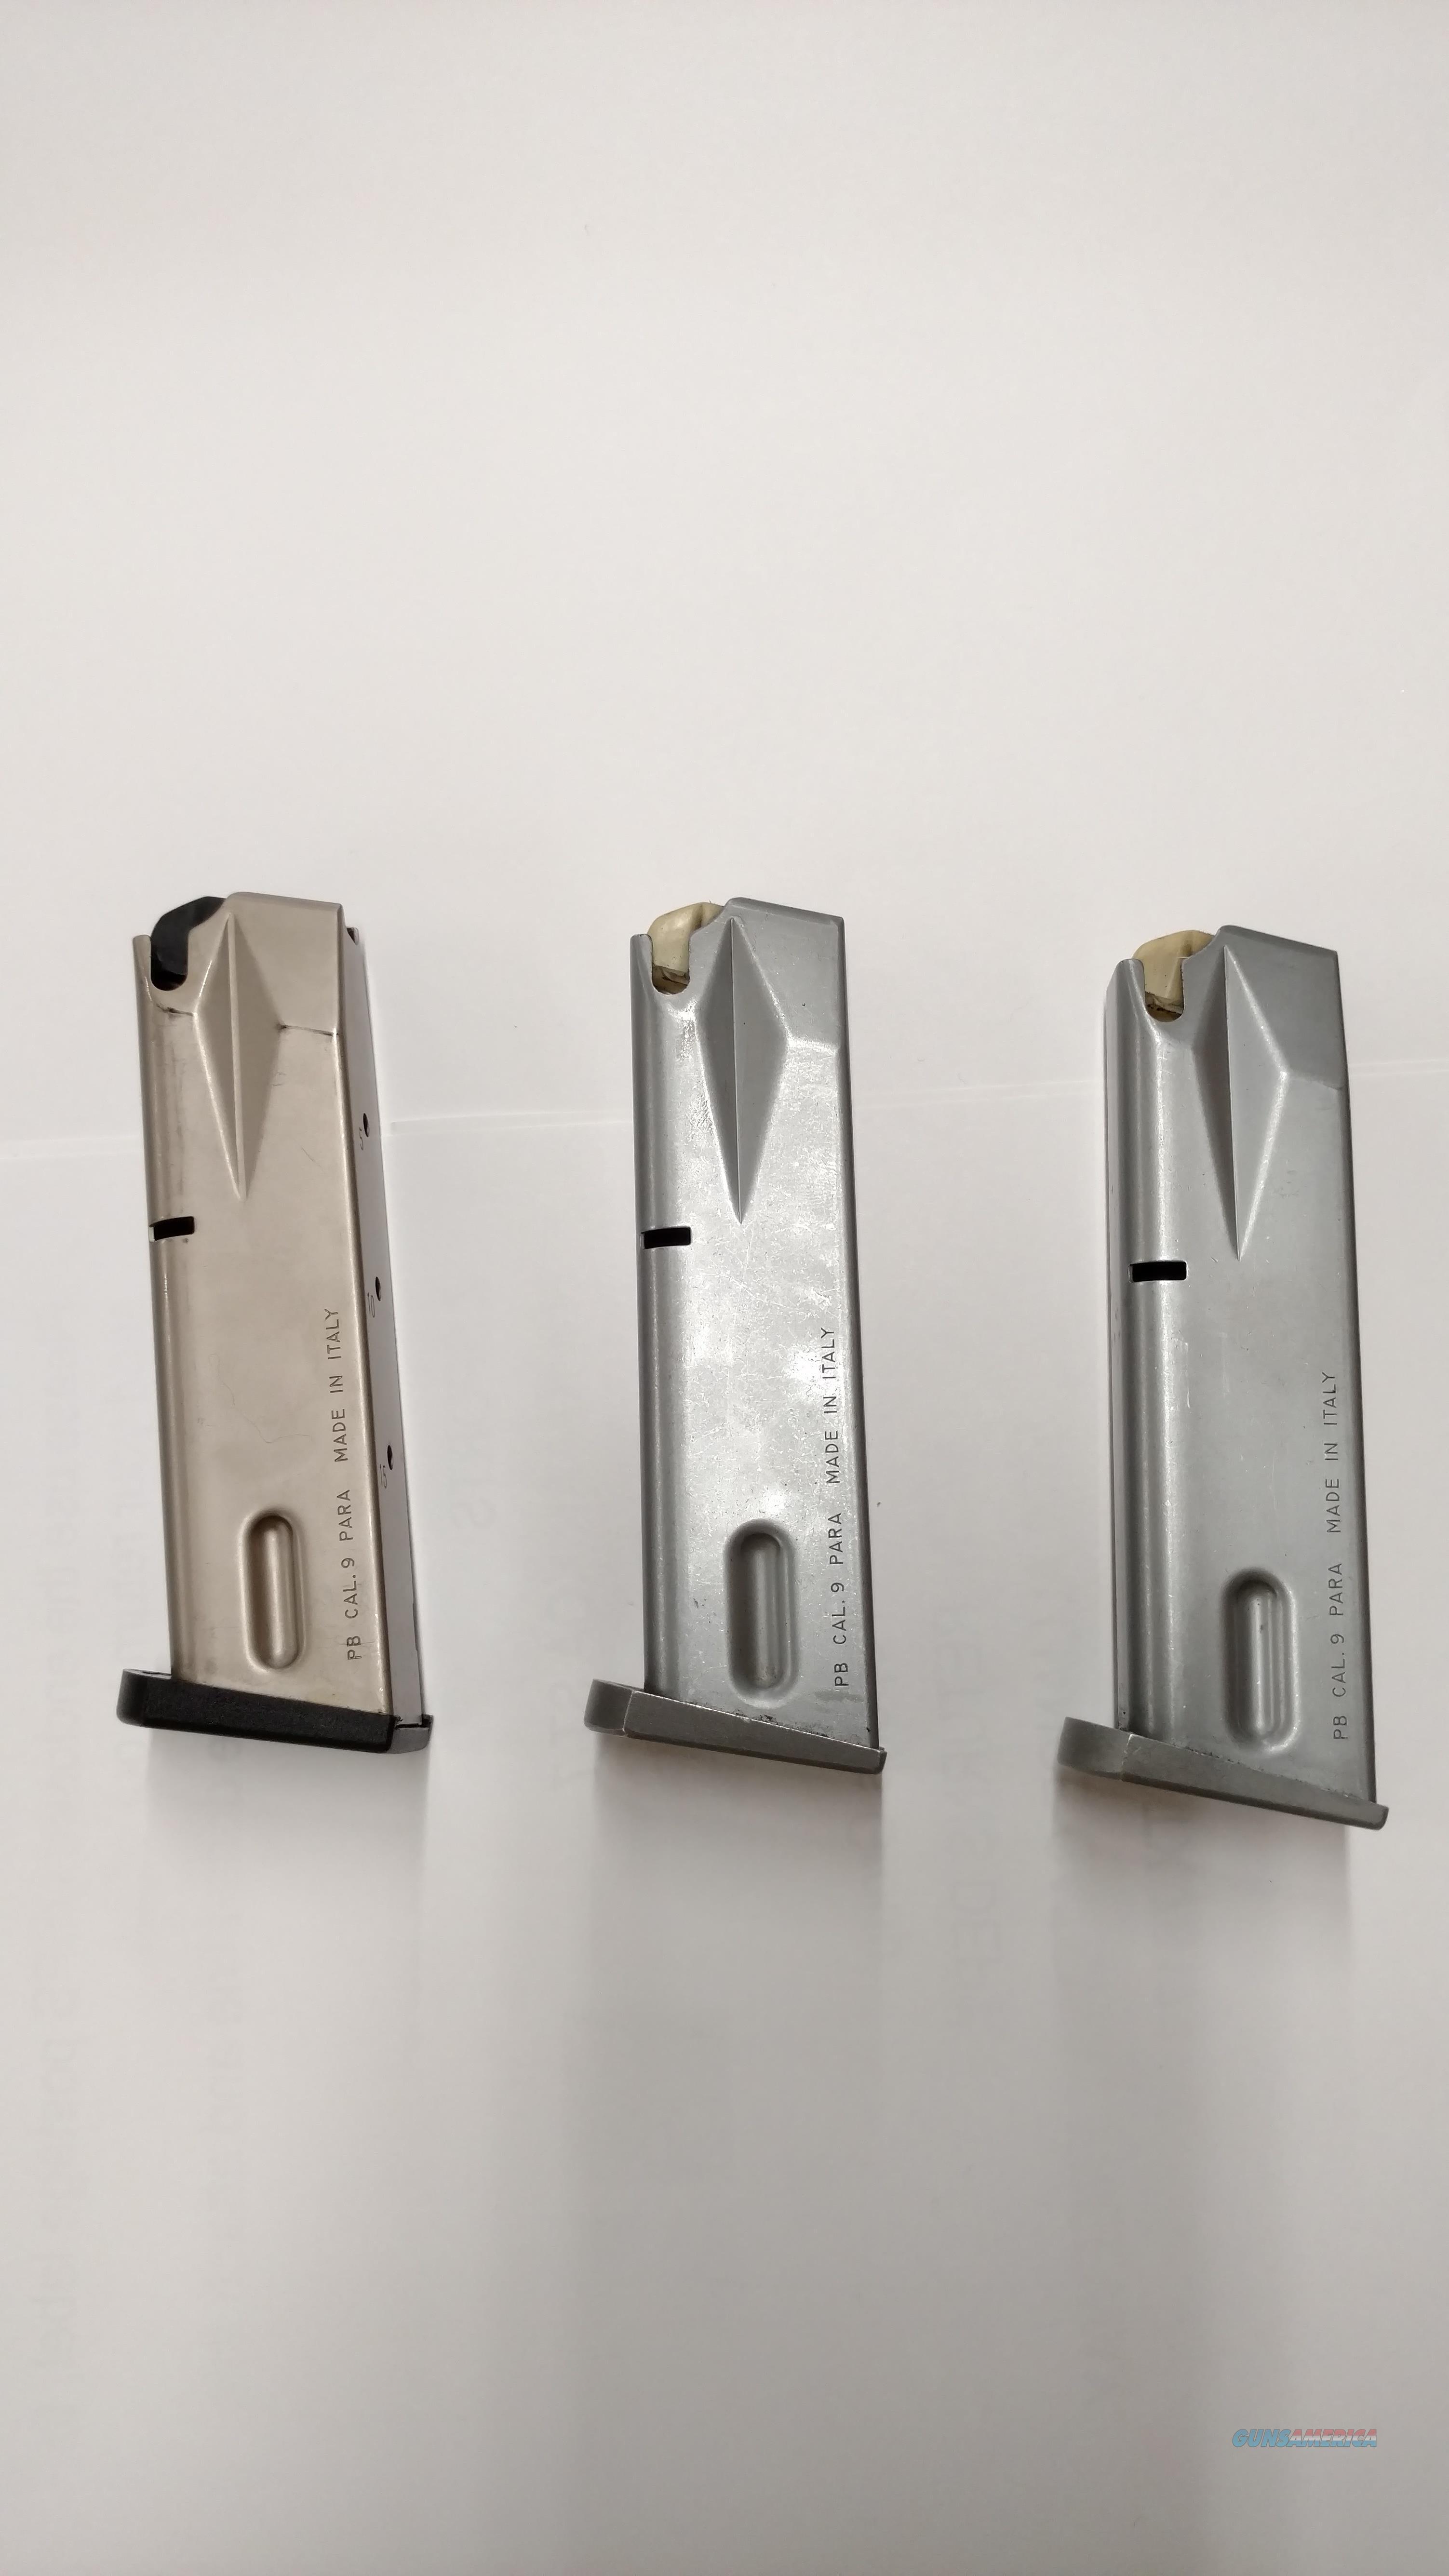 Beretta 92 FS 9mm mags  Non-Guns > Magazines & Clips > Pistol Magazines > Beretta